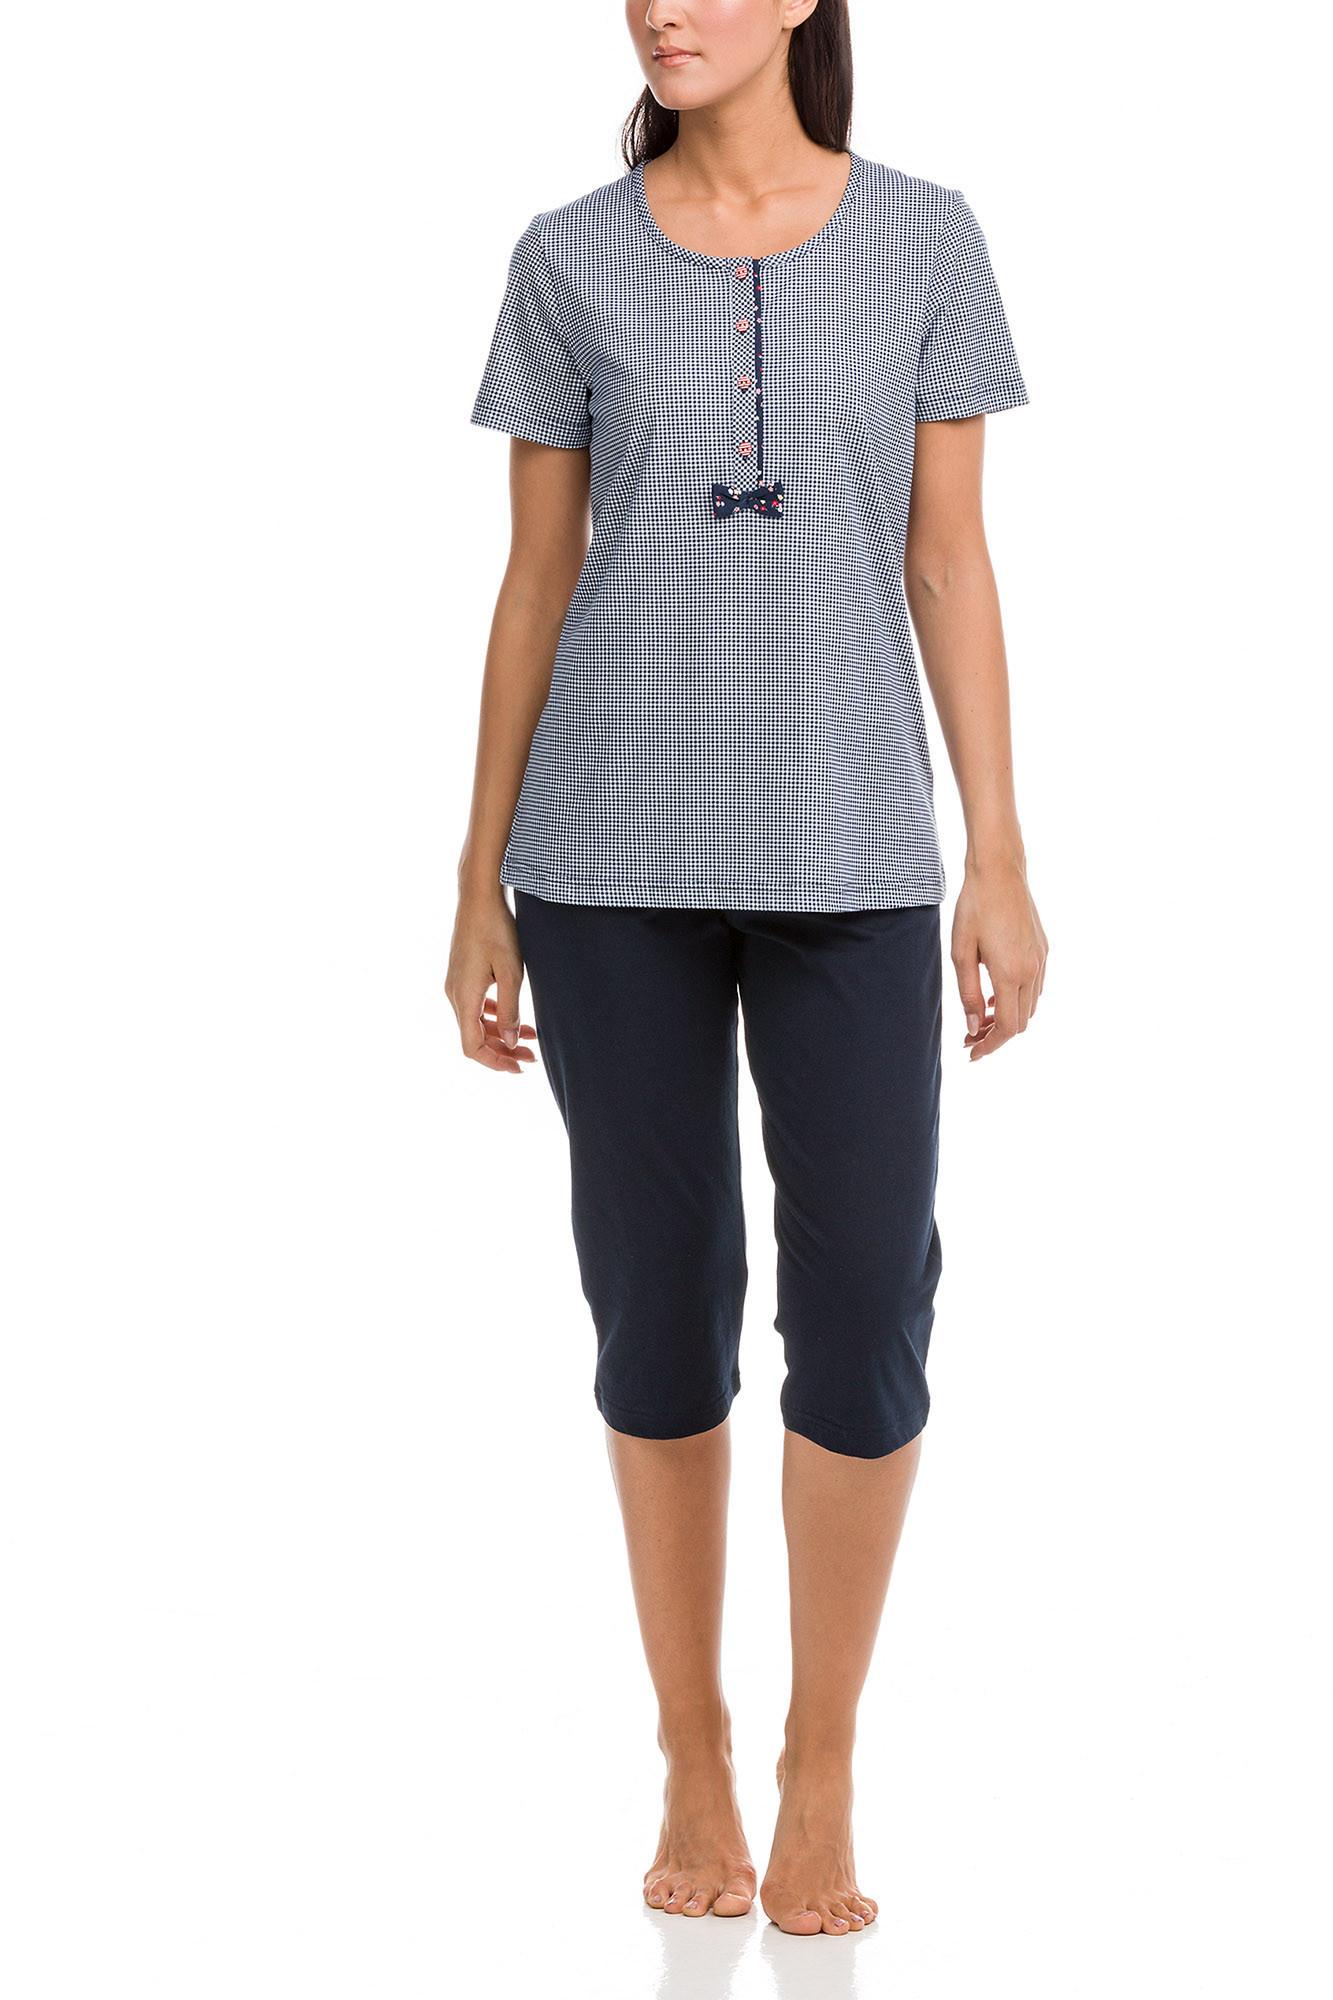 Vamp - Dámske pyžamo 12410 - Vamp blue l